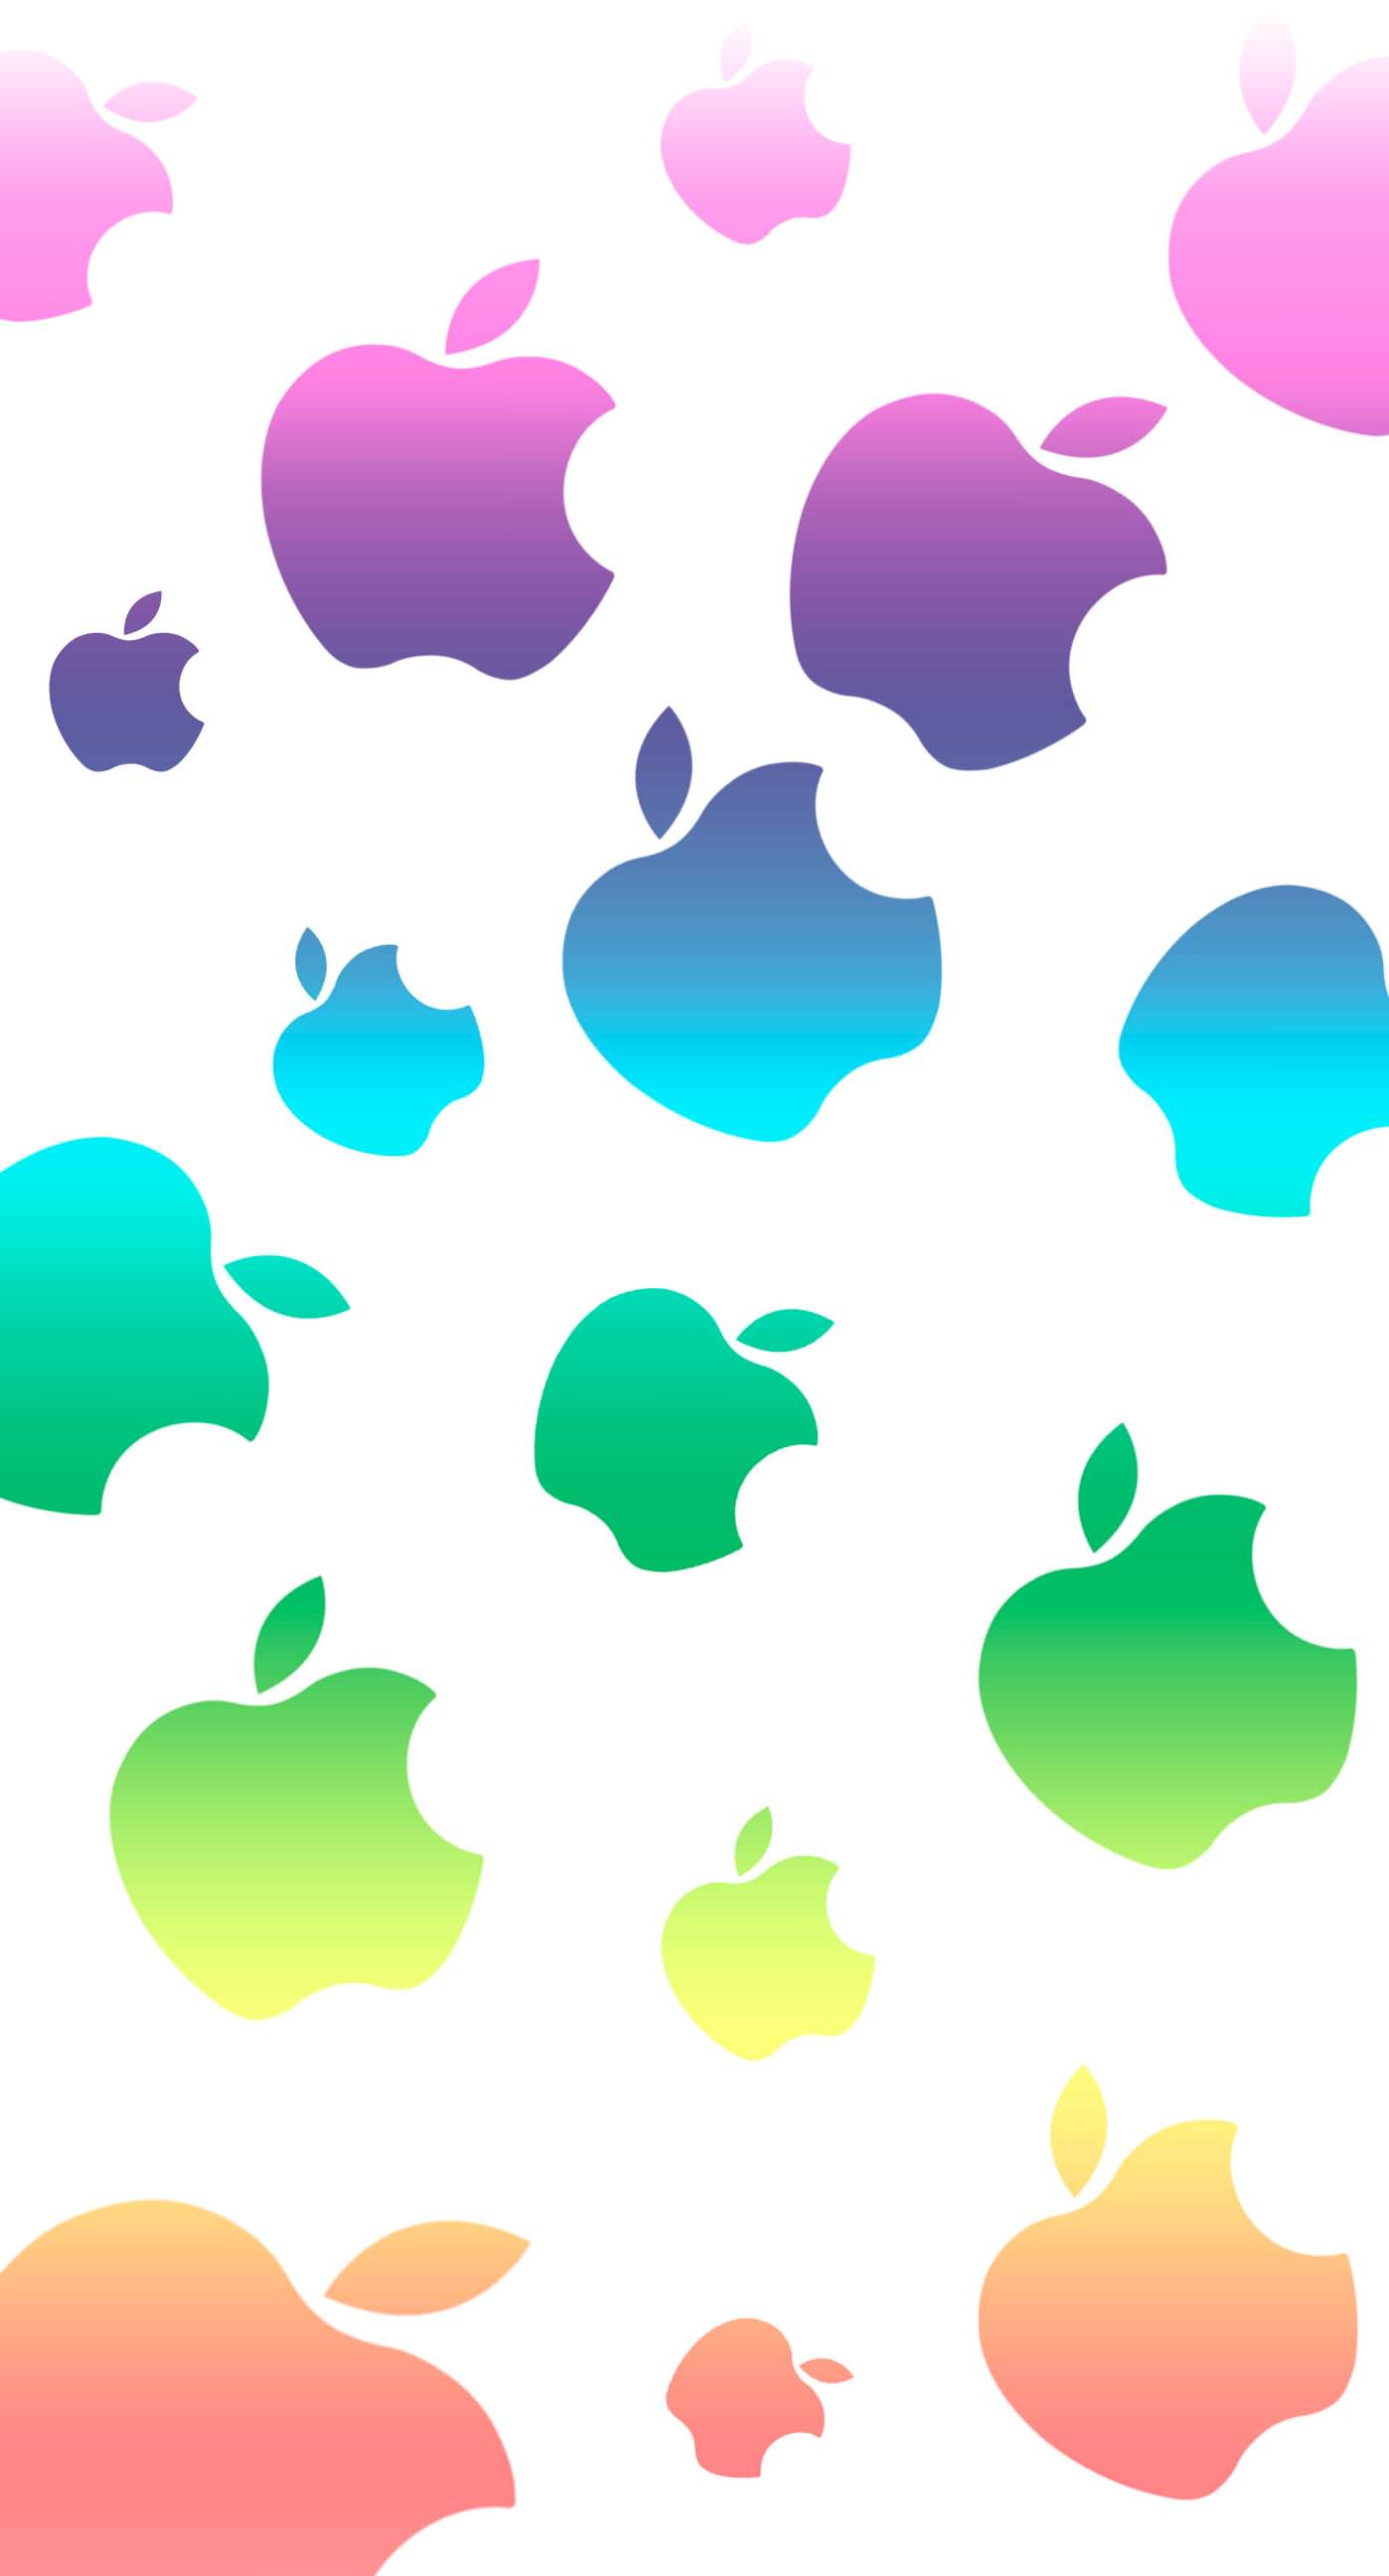 Cute colorful Apple | wallpaper.sc iPhone6sPlus